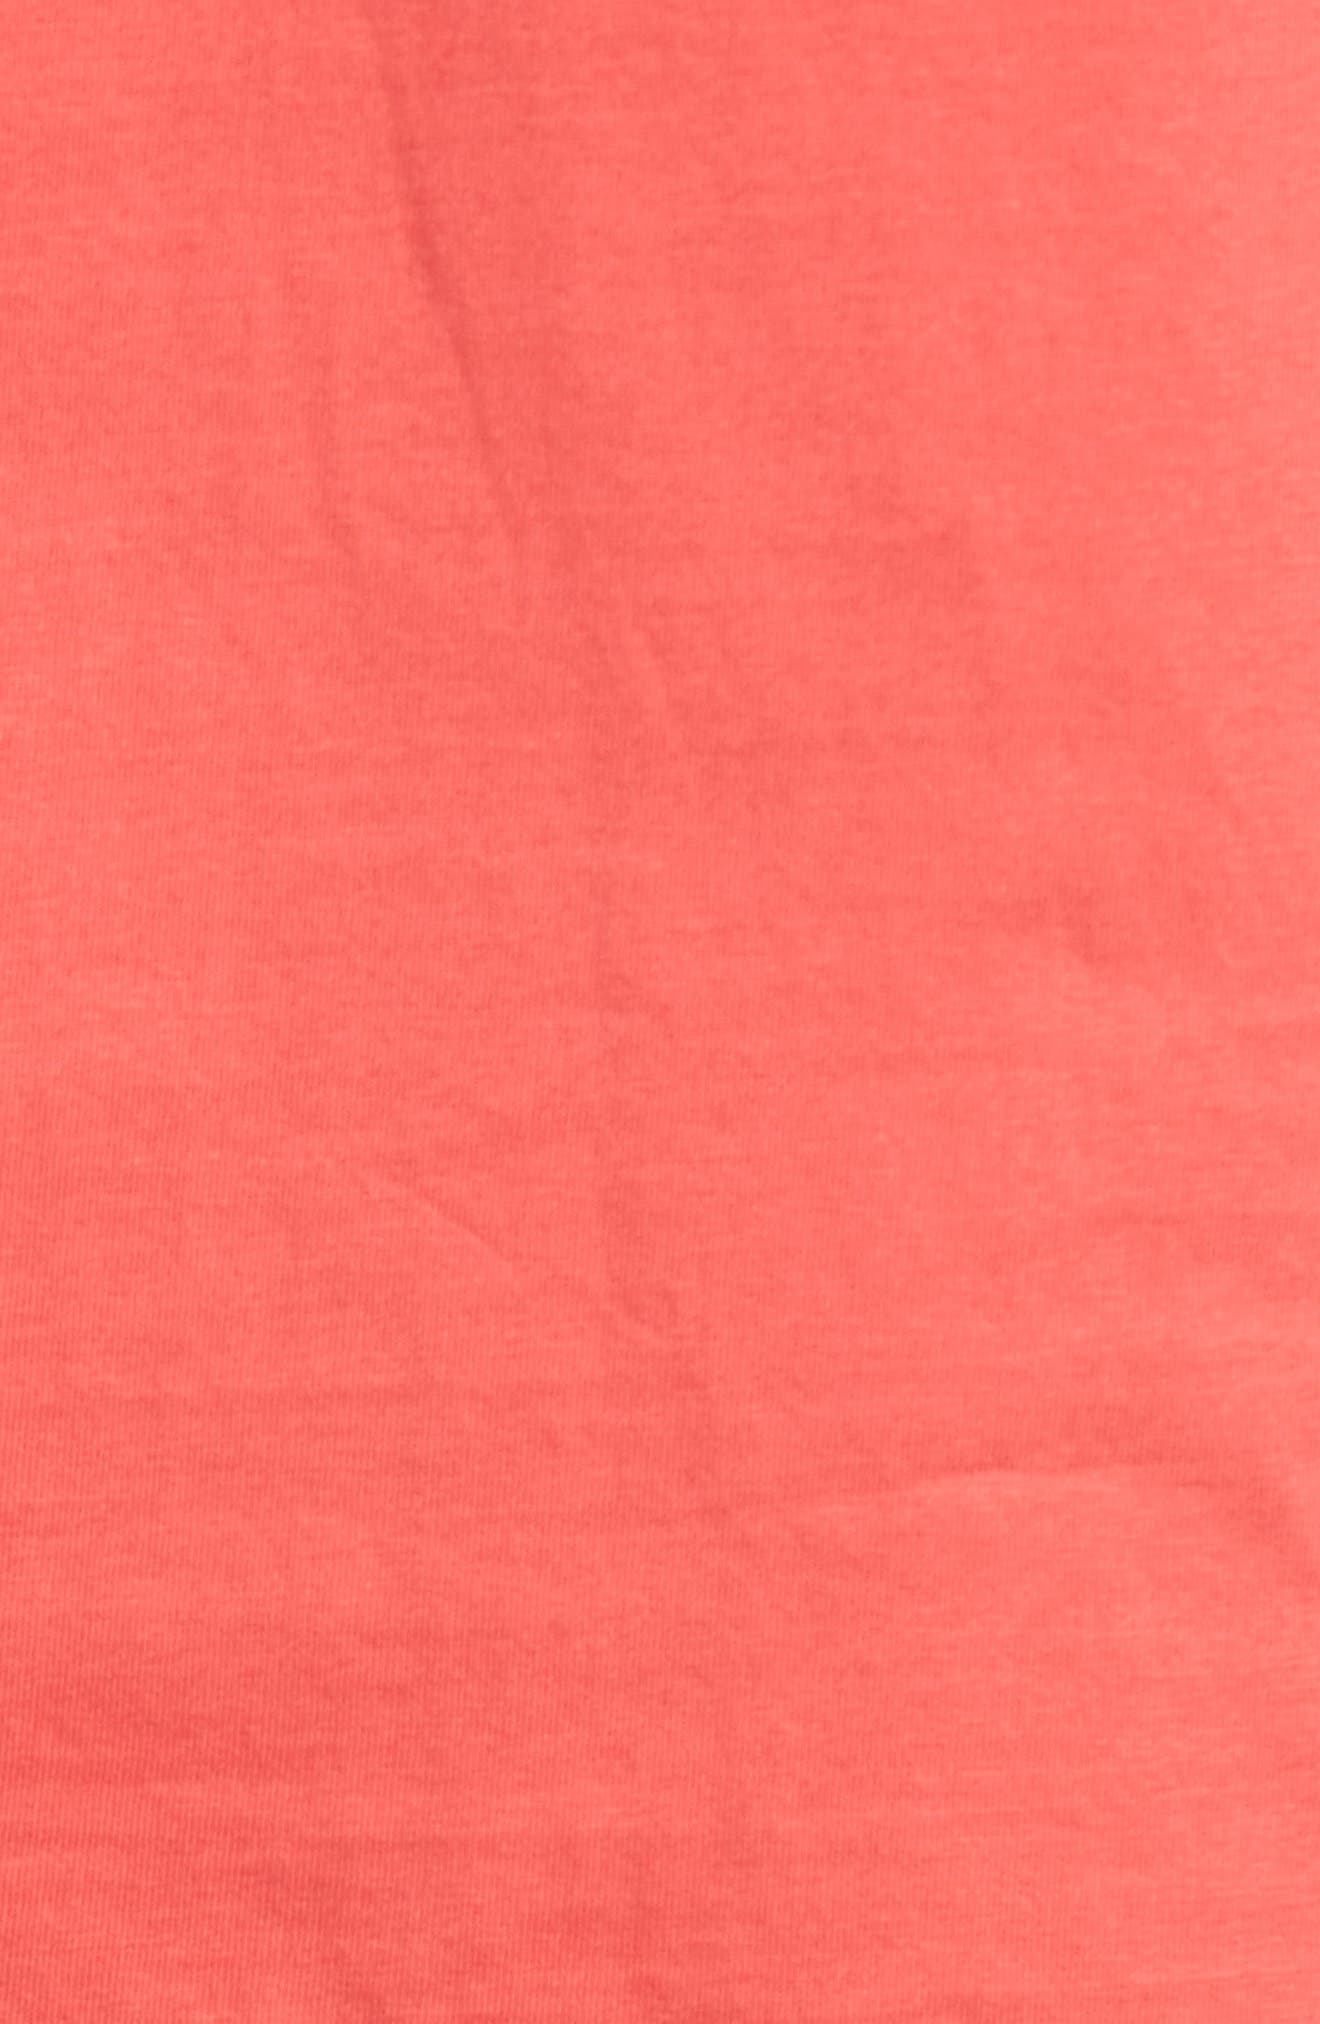 Fusion Pajama Set,                             Alternate thumbnail 5, color,                             Red/ Lead